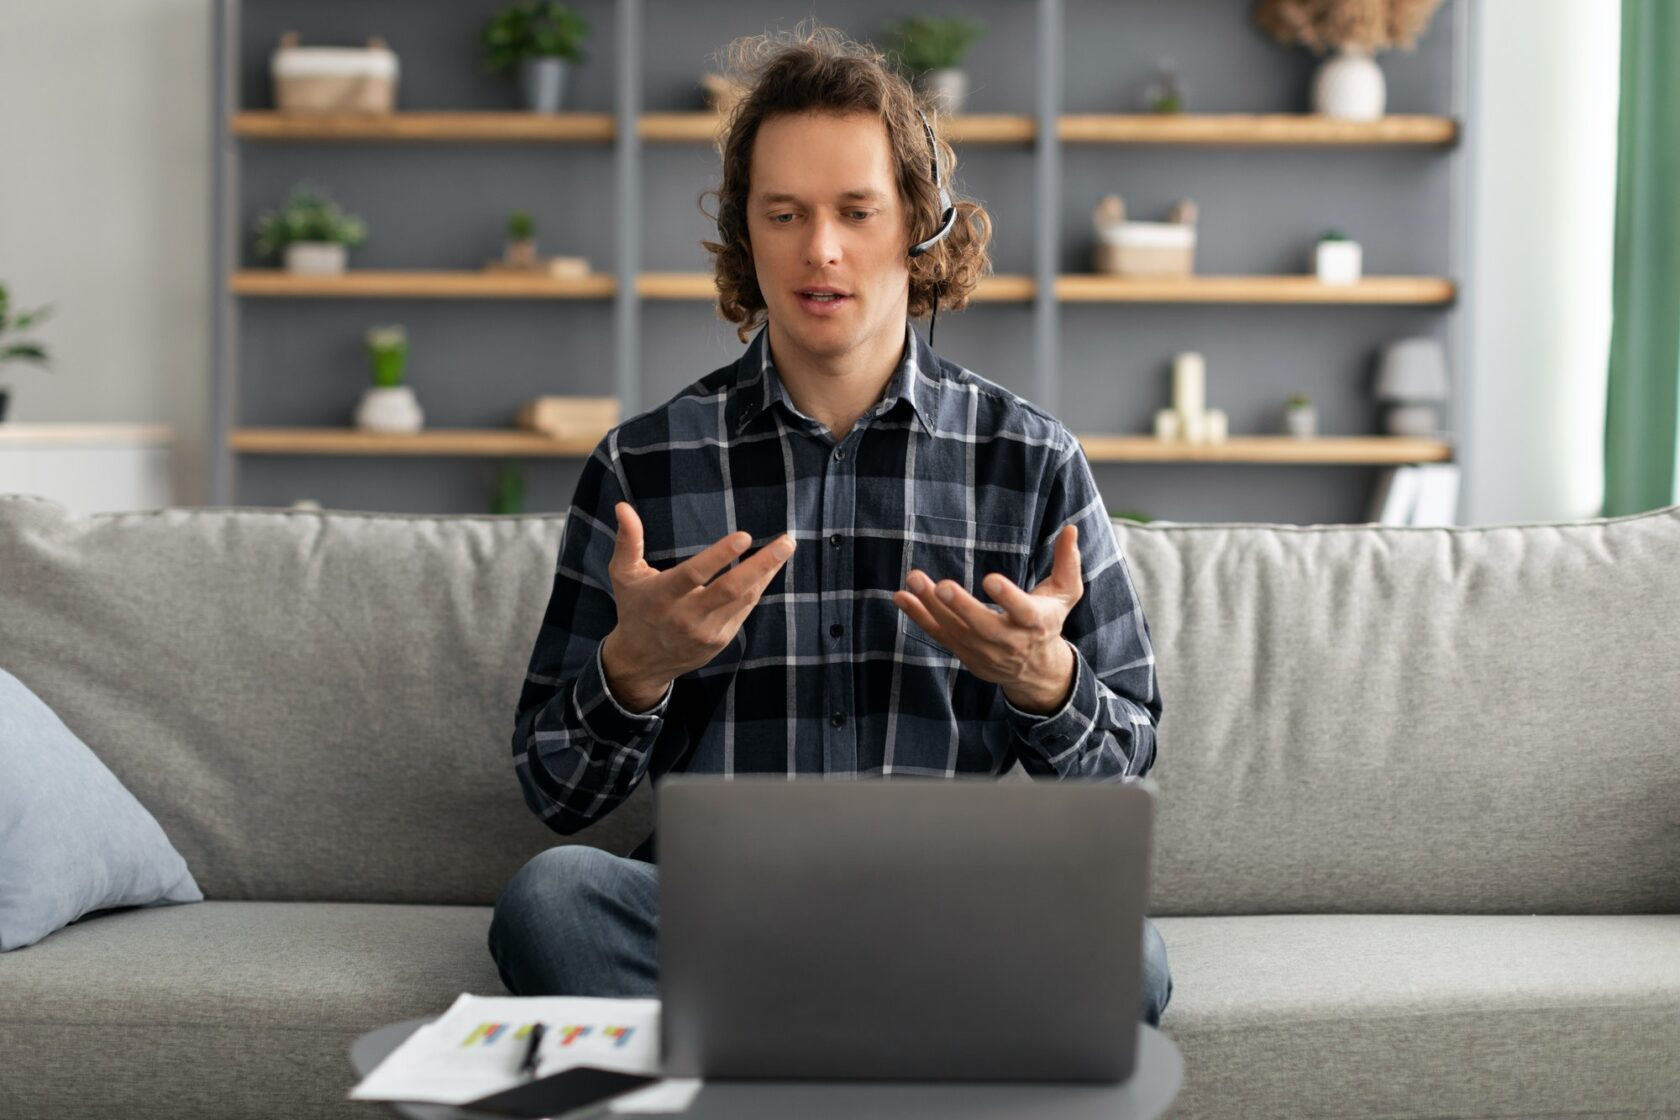 Man Video Calling At Laptop Having Virtual Meeting At Home